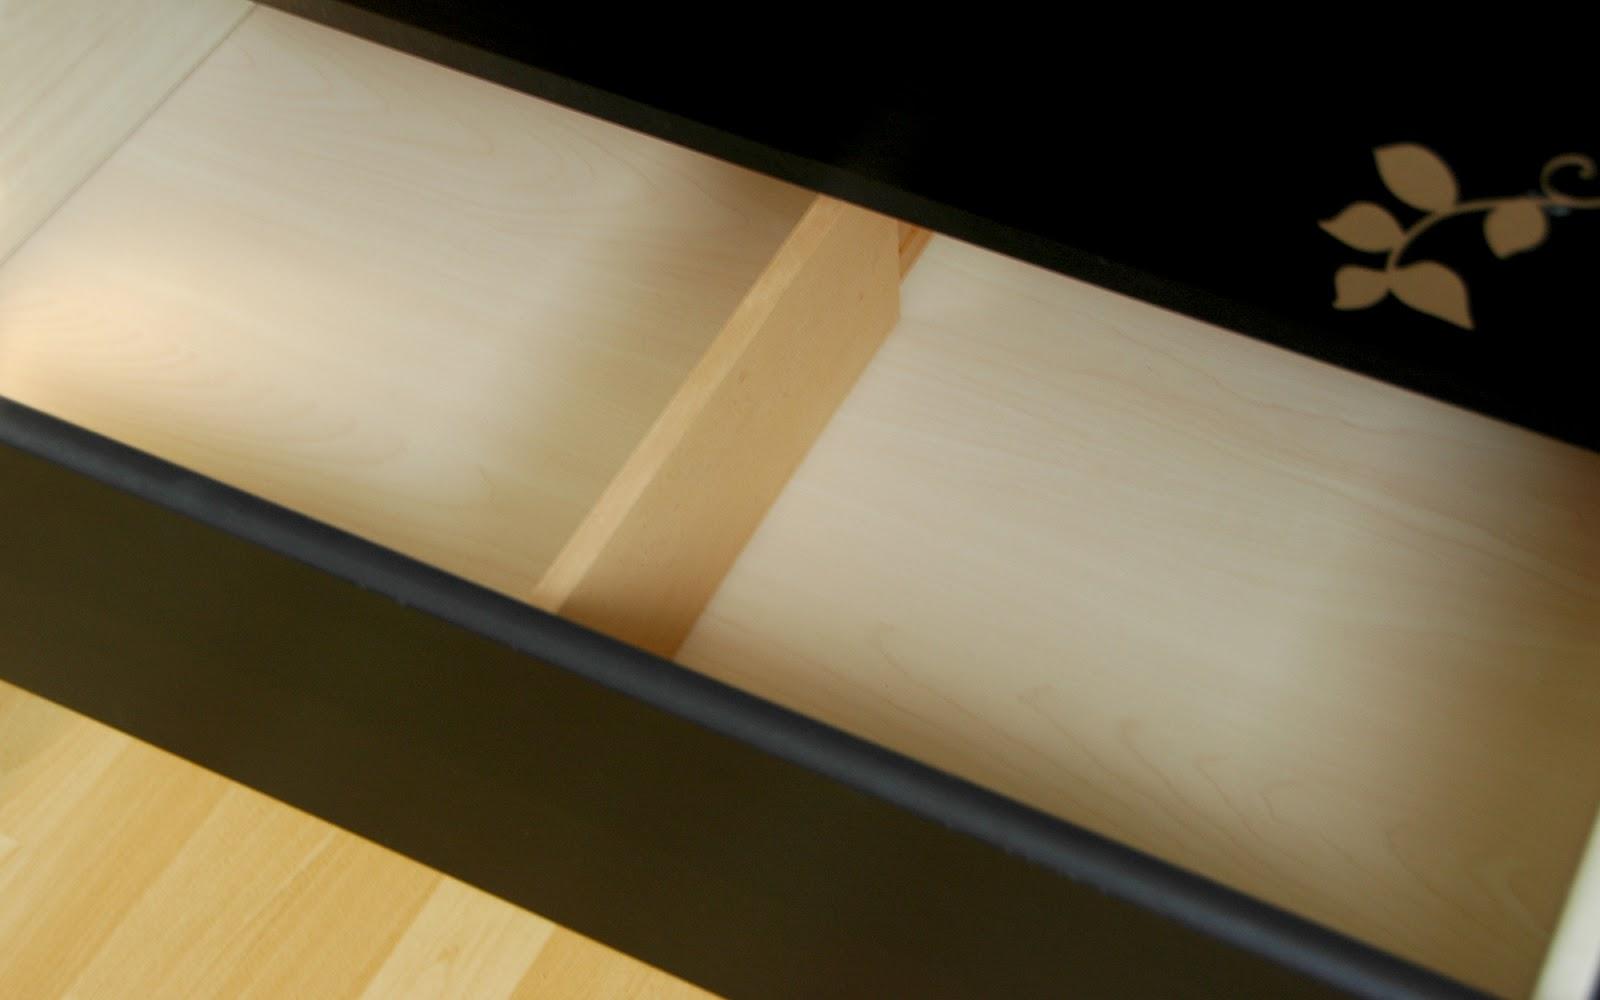 missmonday mai 2013. Black Bedroom Furniture Sets. Home Design Ideas